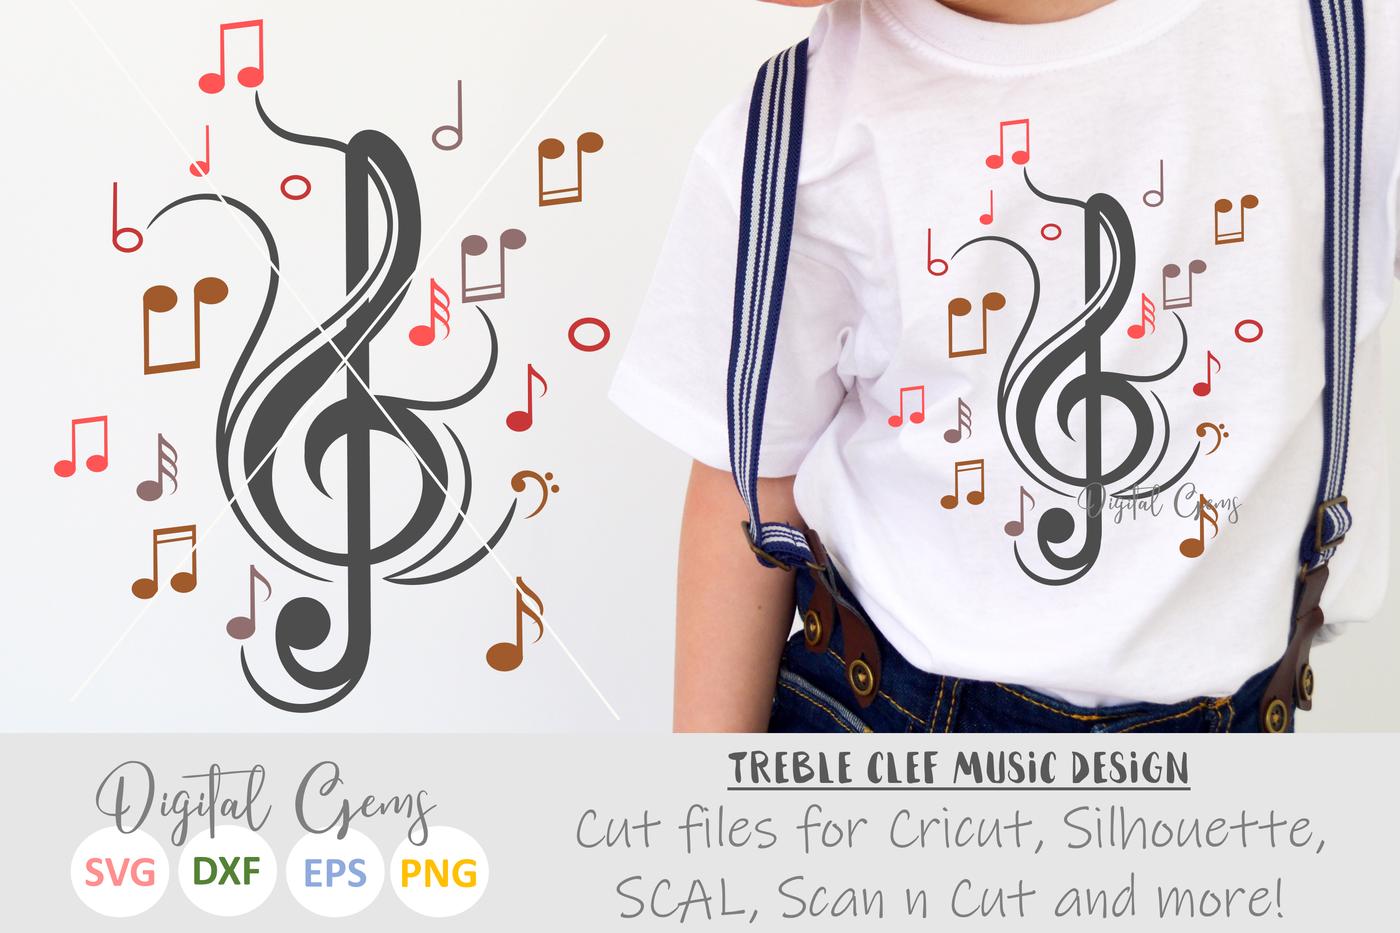 Treble Clef Music Design By Digital Gems Thehungryjpeg Com